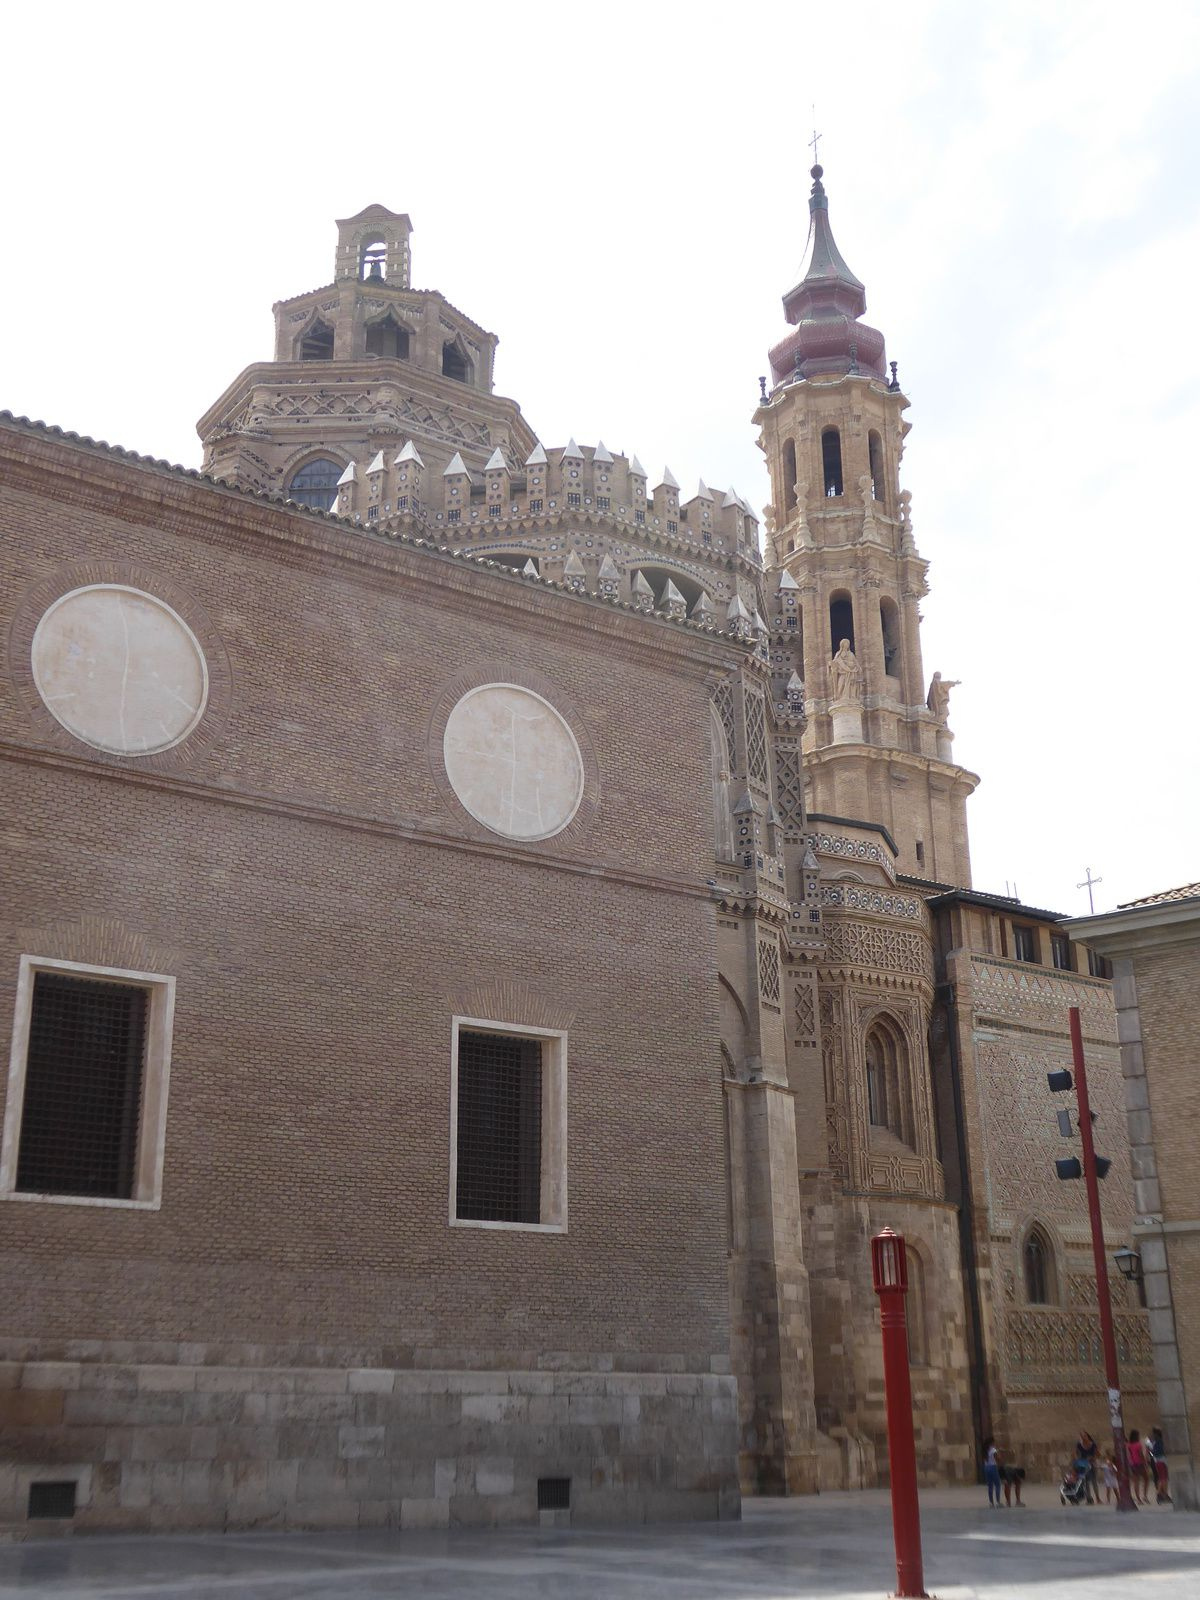 Espagne 2019 #18 Saragosse jour 2 après-midi